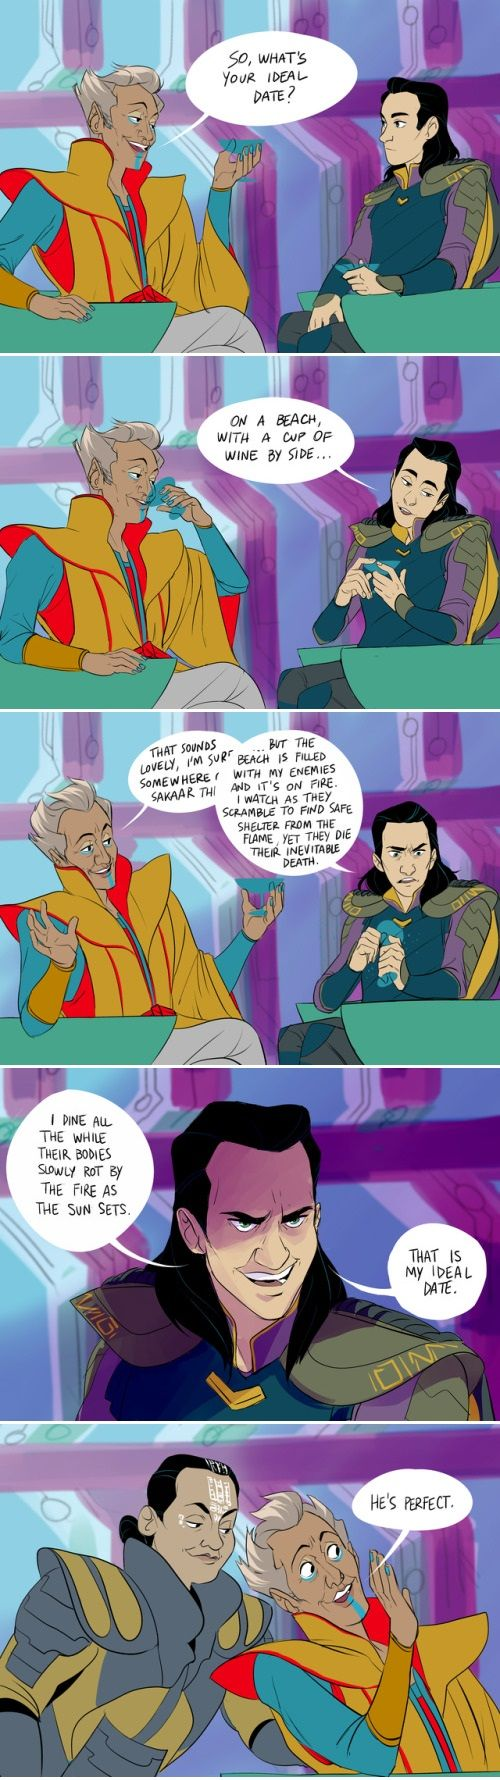 Thor: Ragnarok spoilers. Loki impressing the Grandmaster.